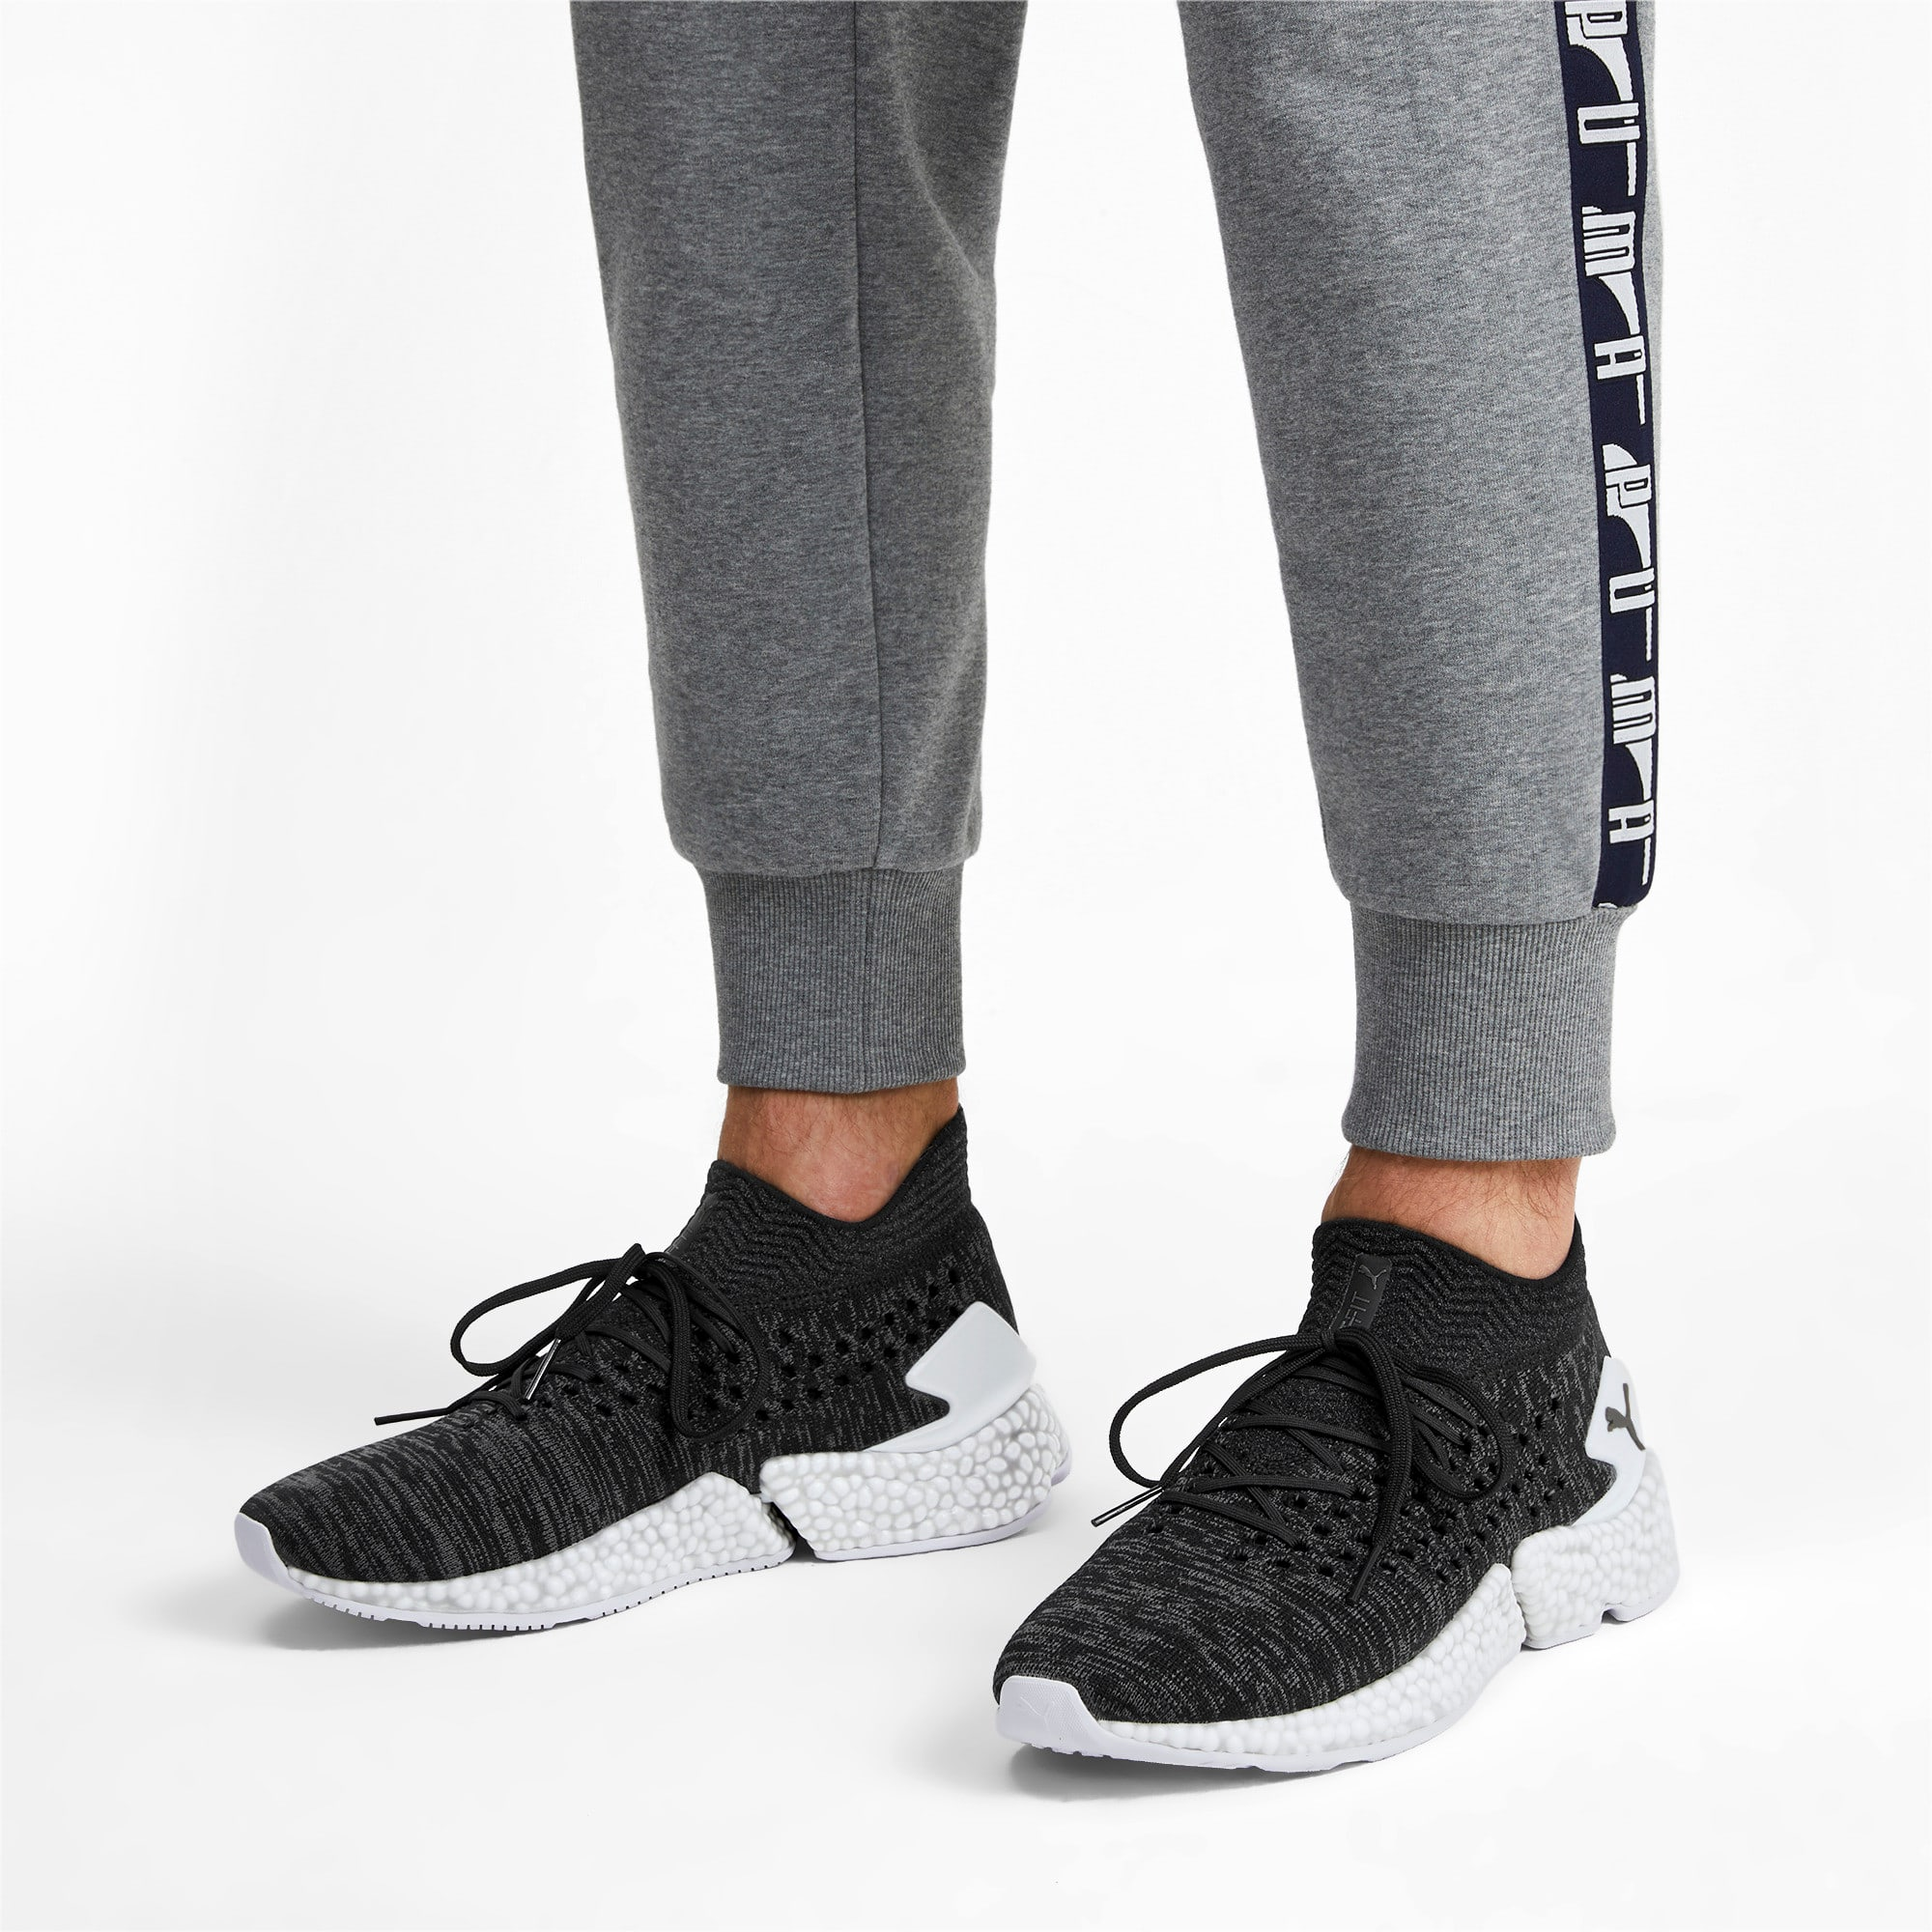 Thumbnail 3 of FUTURE Orbiter Men's Soccer Shoes, Black-Black-Puma Aged Silver, medium